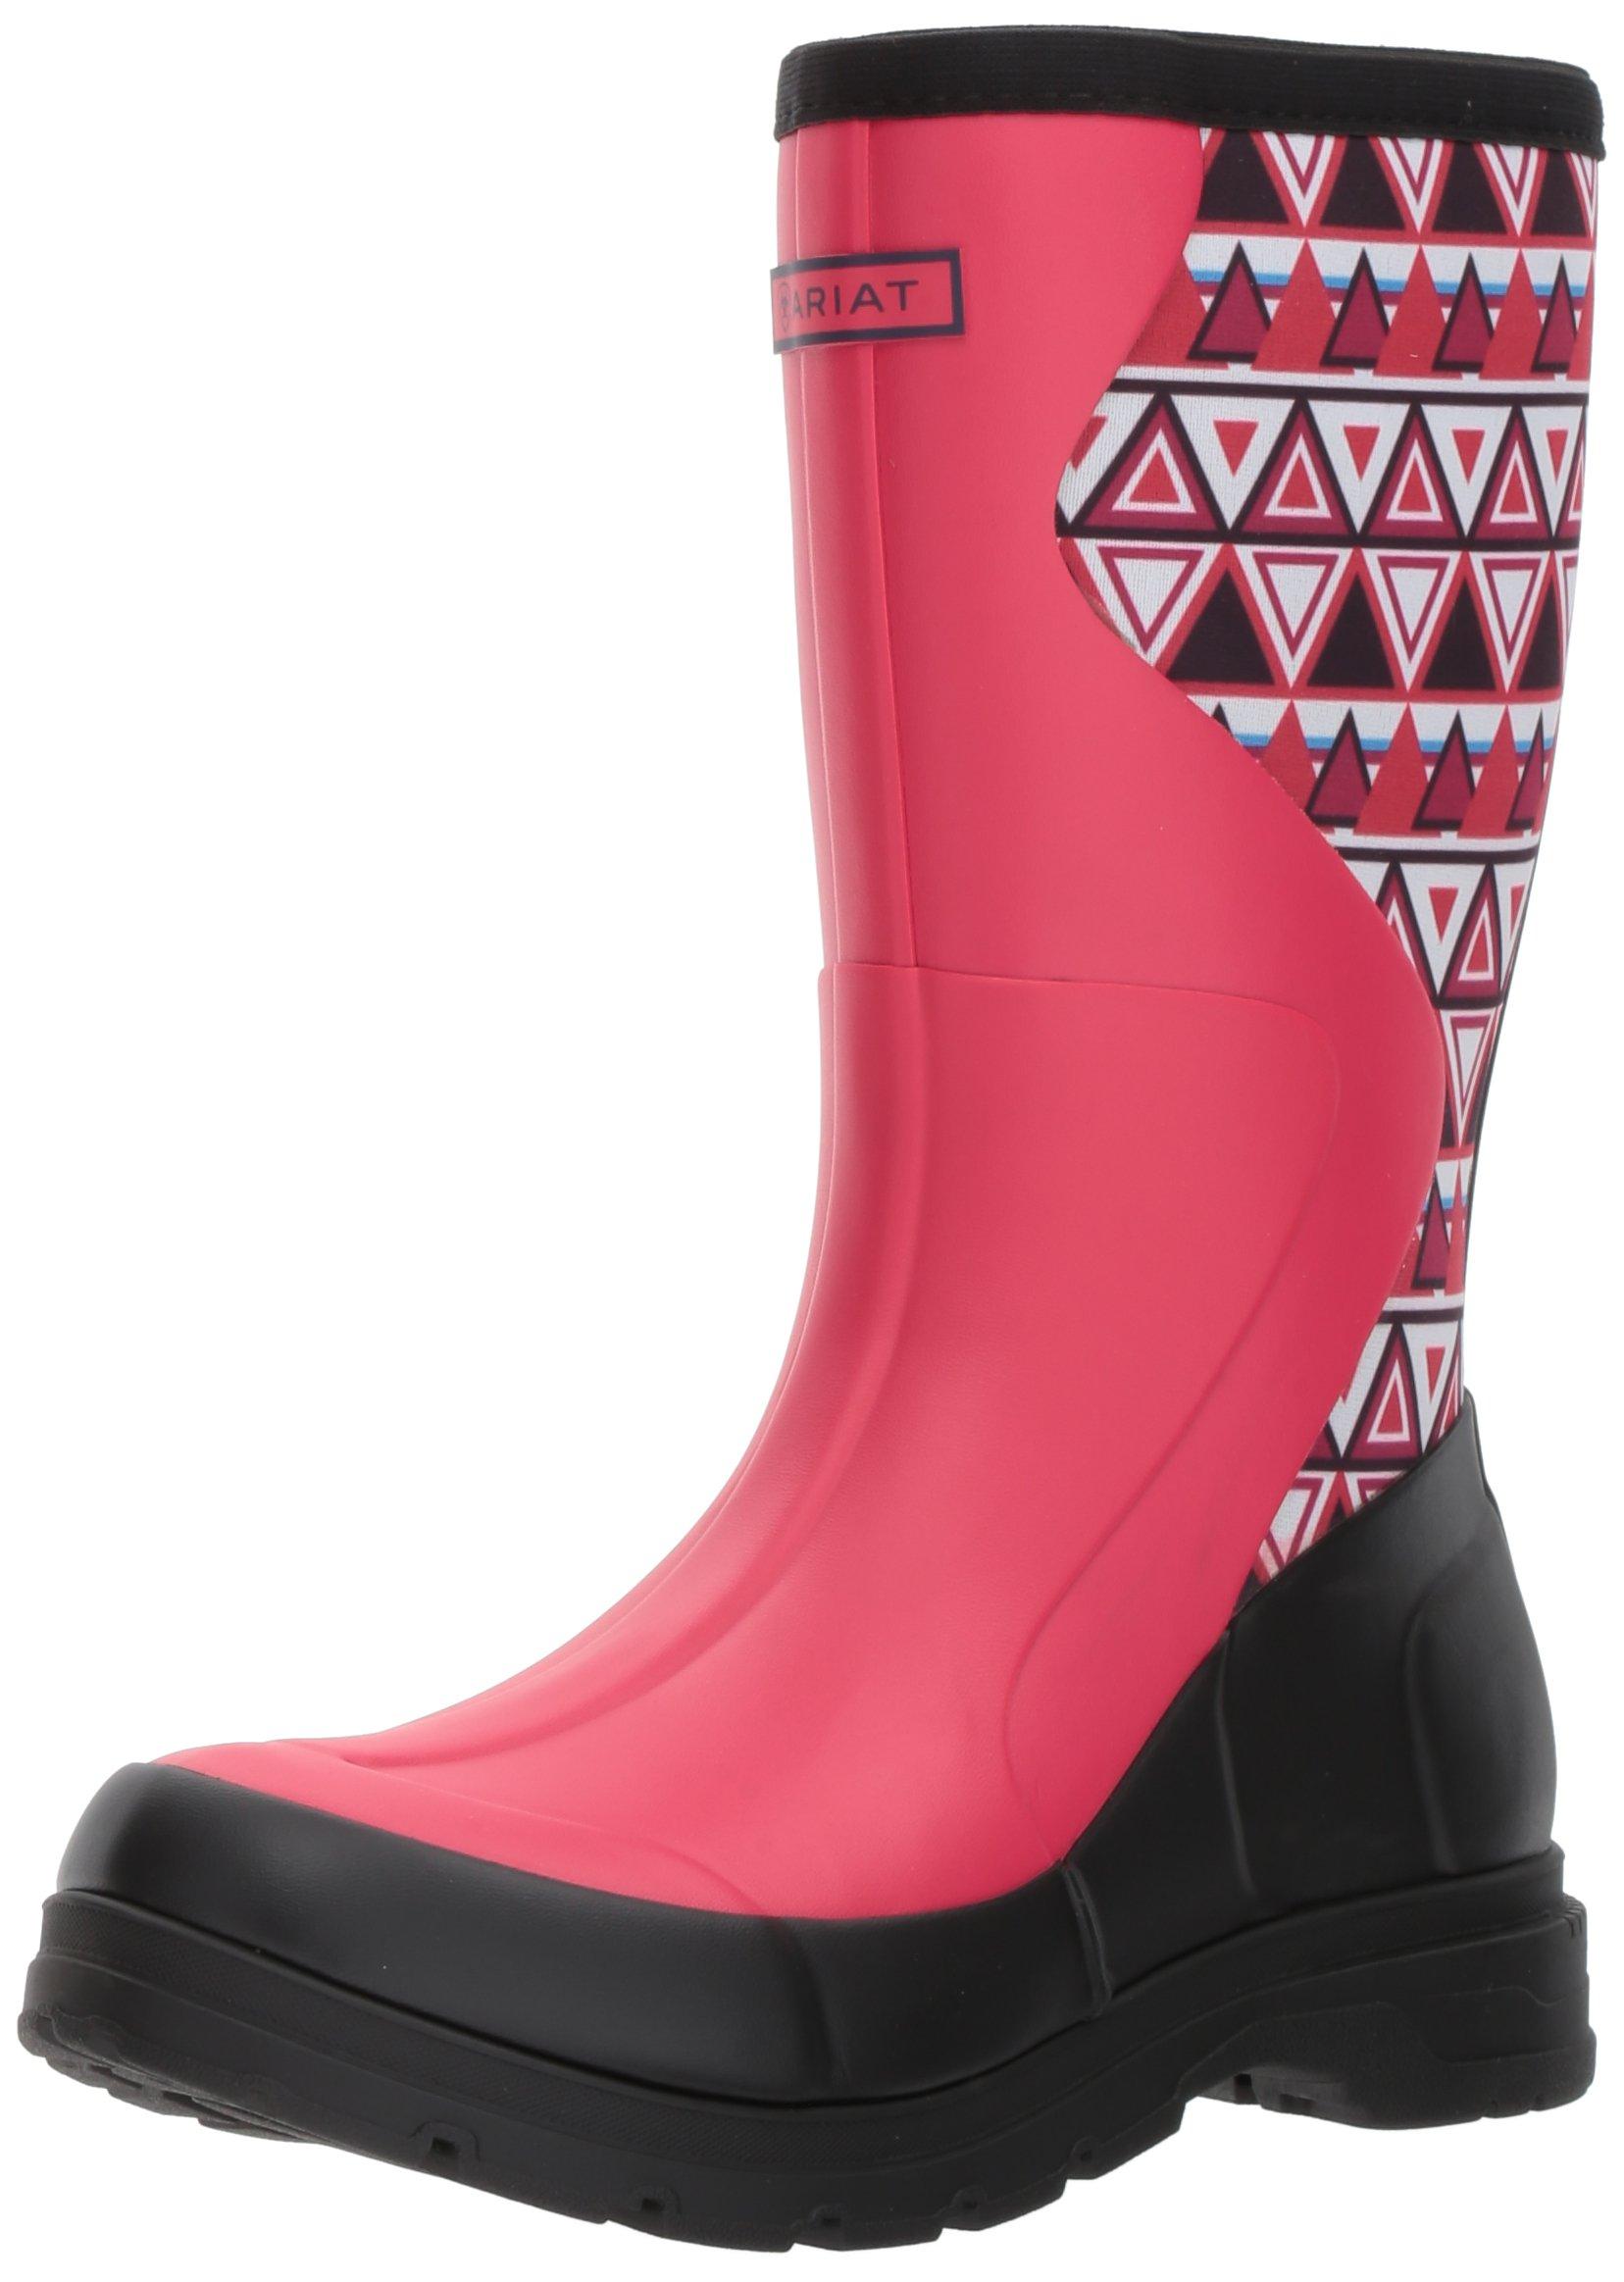 Ariat Women's Springfield Rubber Work Boot, Hot Pink, 9 B US